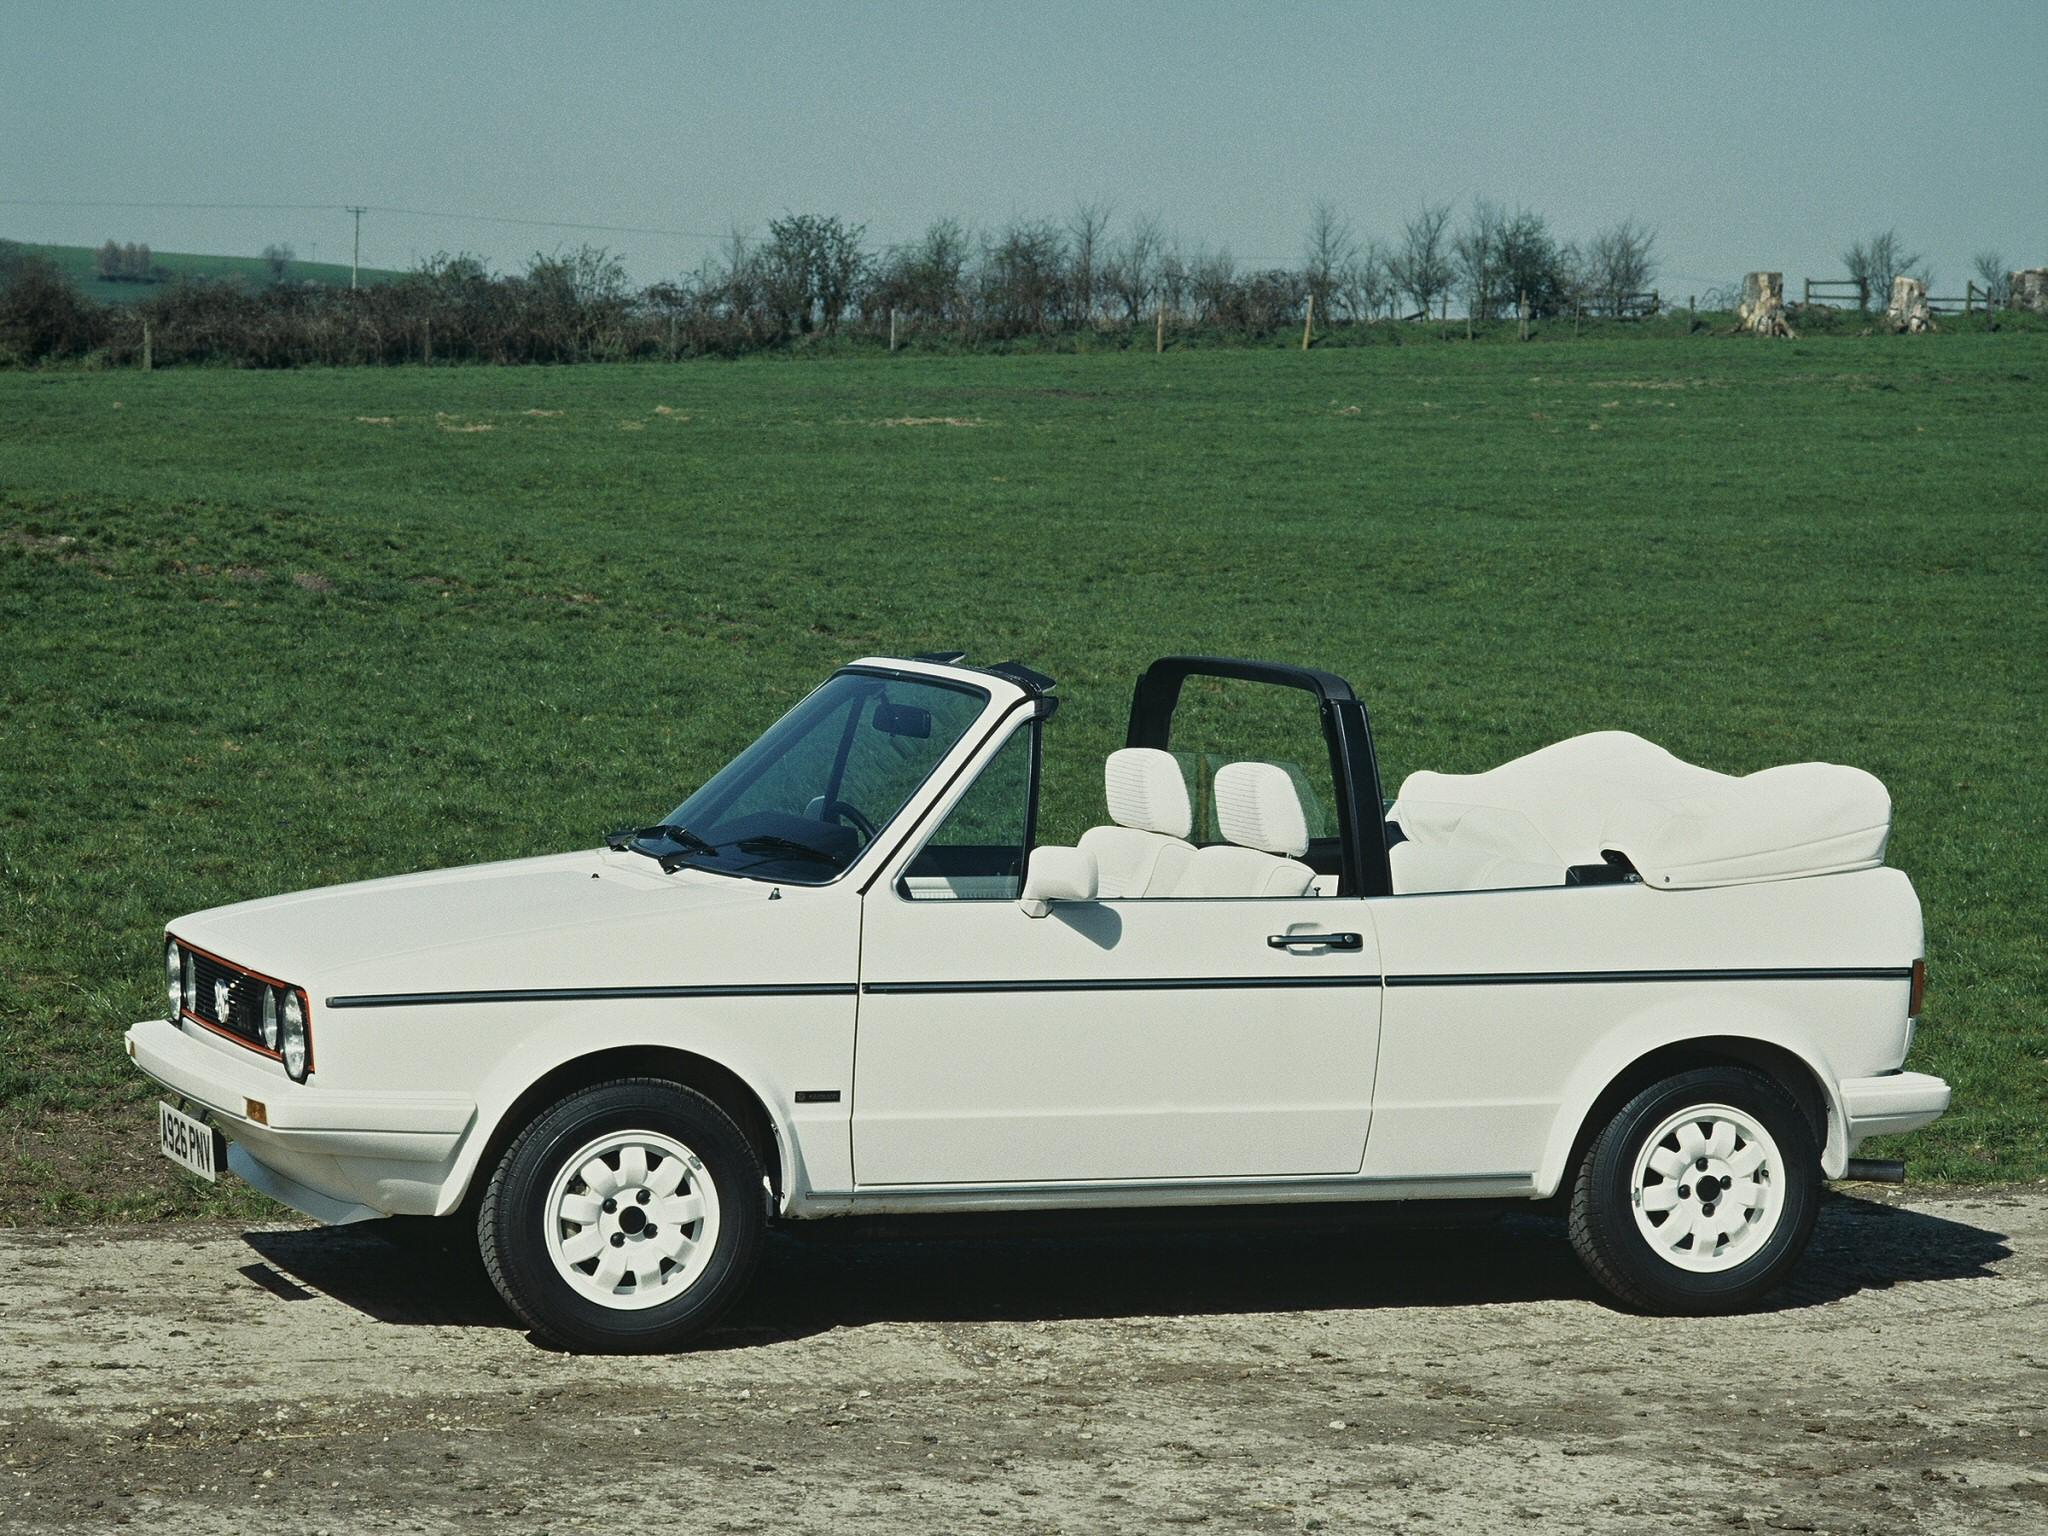 volkswagen golf cabriolet essais fiabilit avis. Black Bedroom Furniture Sets. Home Design Ideas